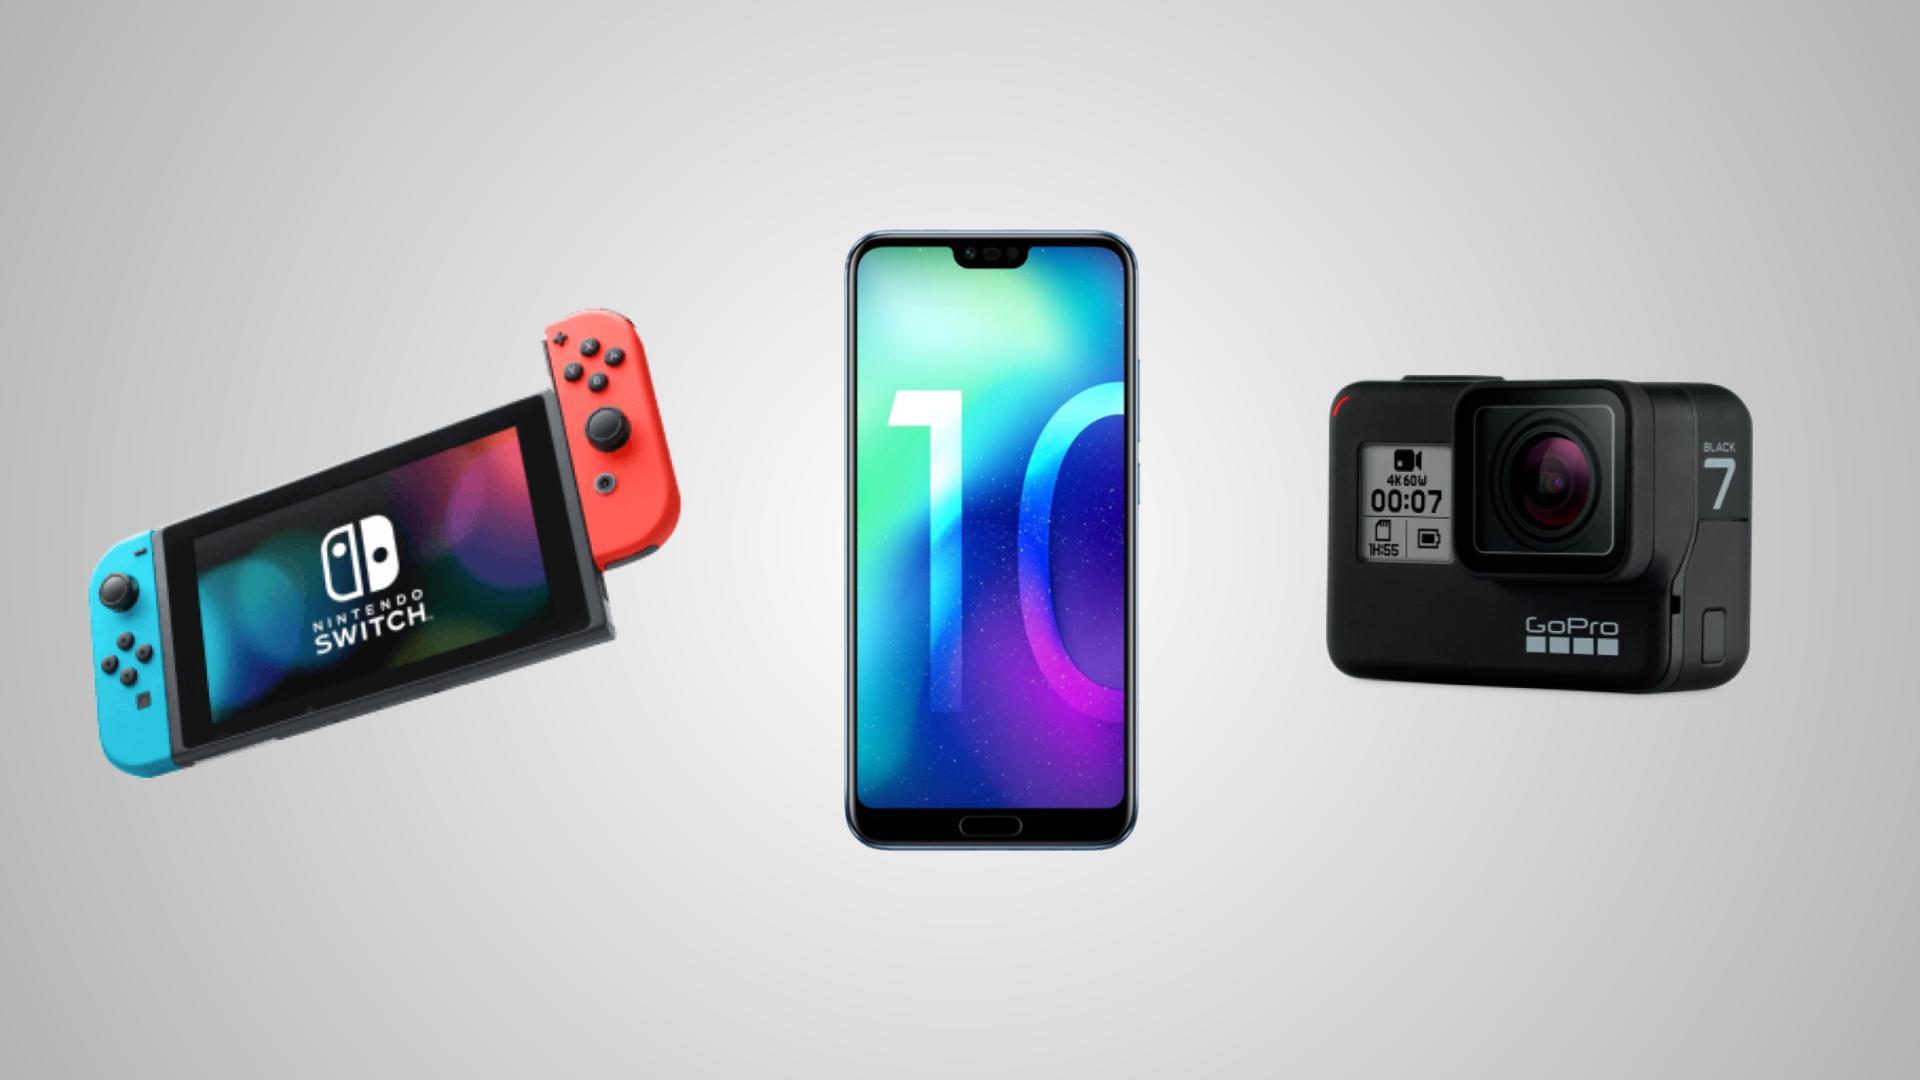 Nintendo Switch à 279 euros, Honor 10 à 299 euros et GoPro Hero7 Black à 349 euros pour le Megapeak Rakuten